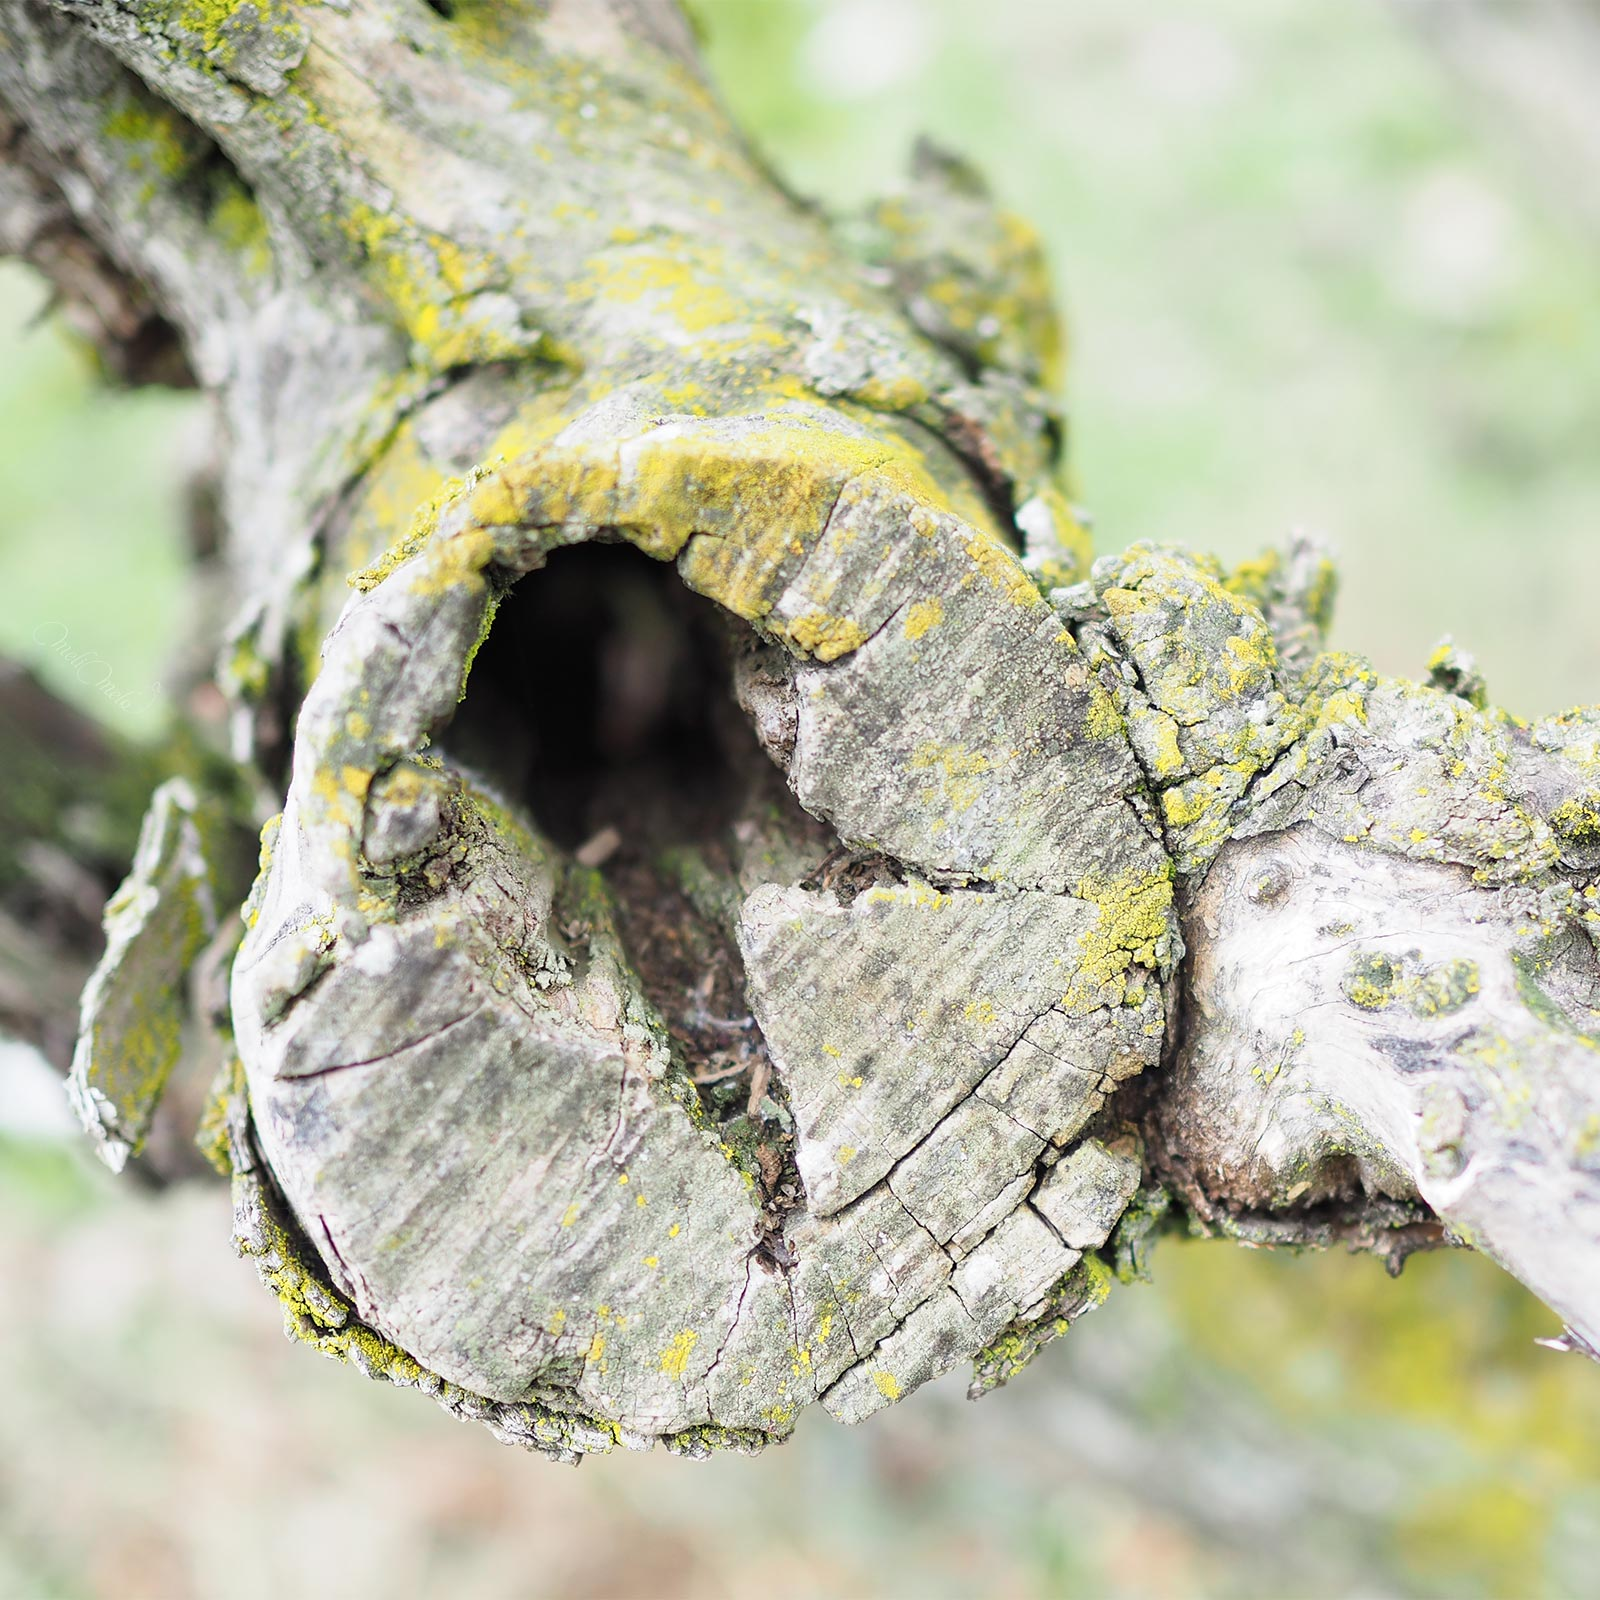 olivier-jardin-bamba-olivo-madera-invierno